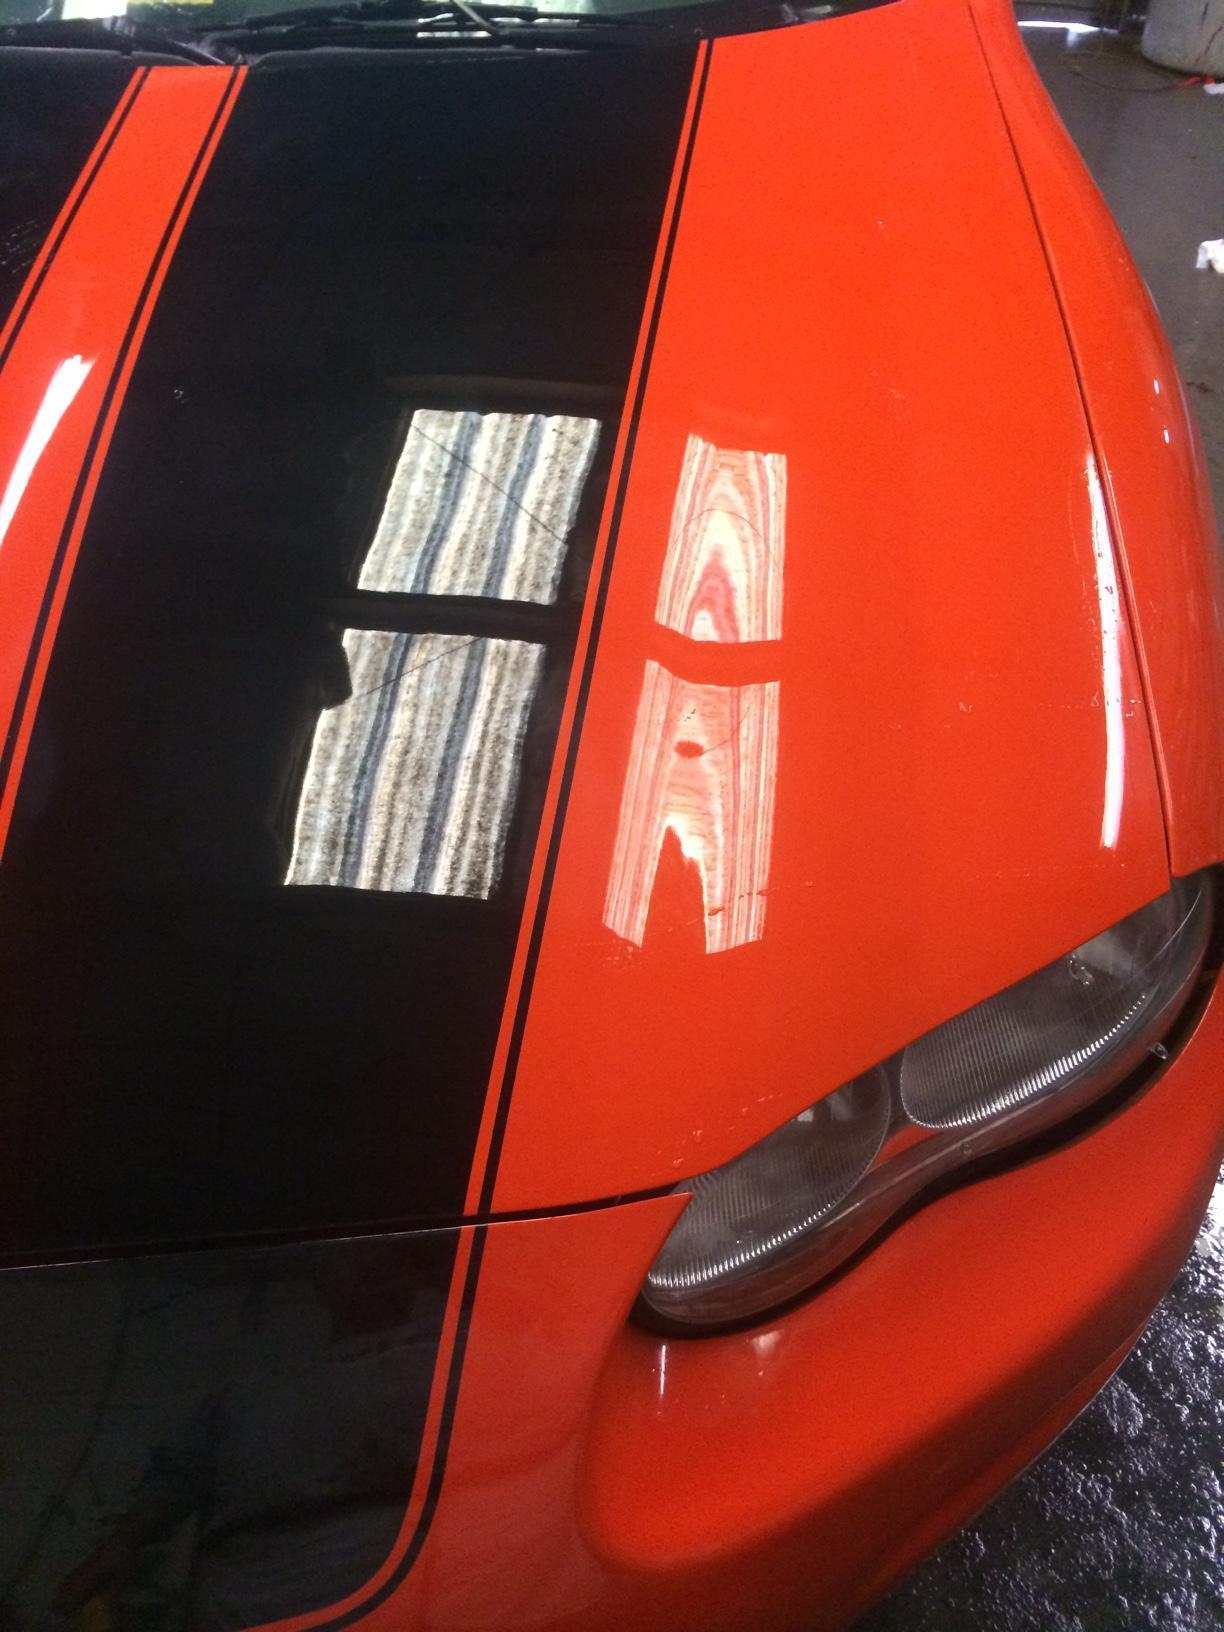 Auto detailing near media paint